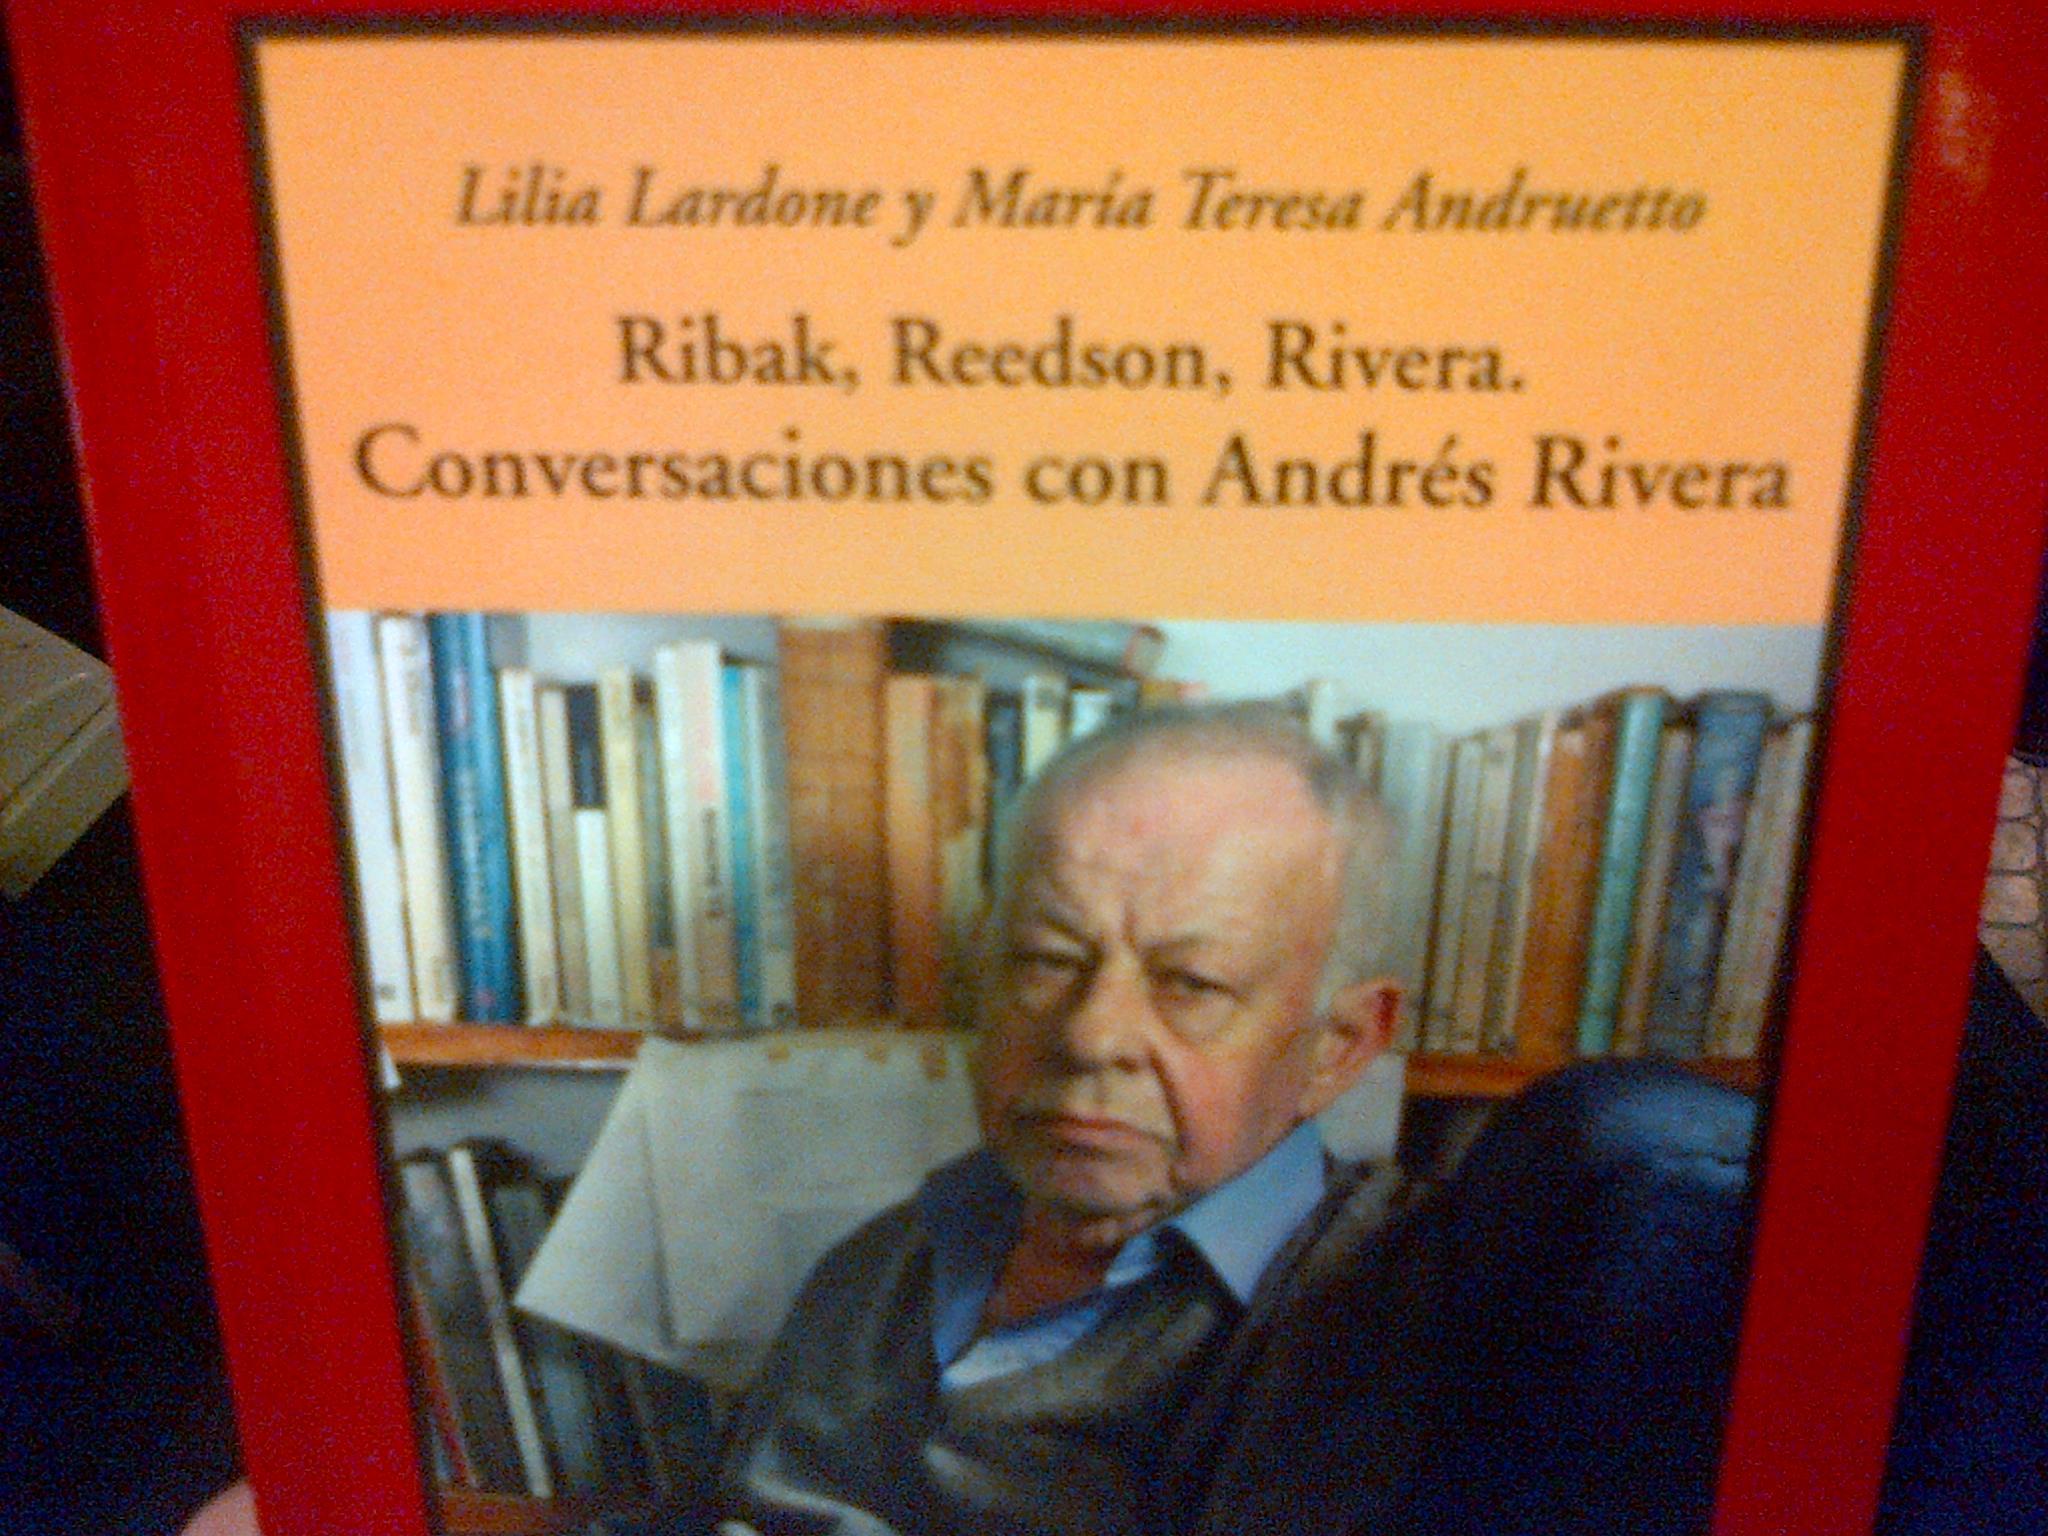 Resultado de imagen para María Teresa Andruetto ribak